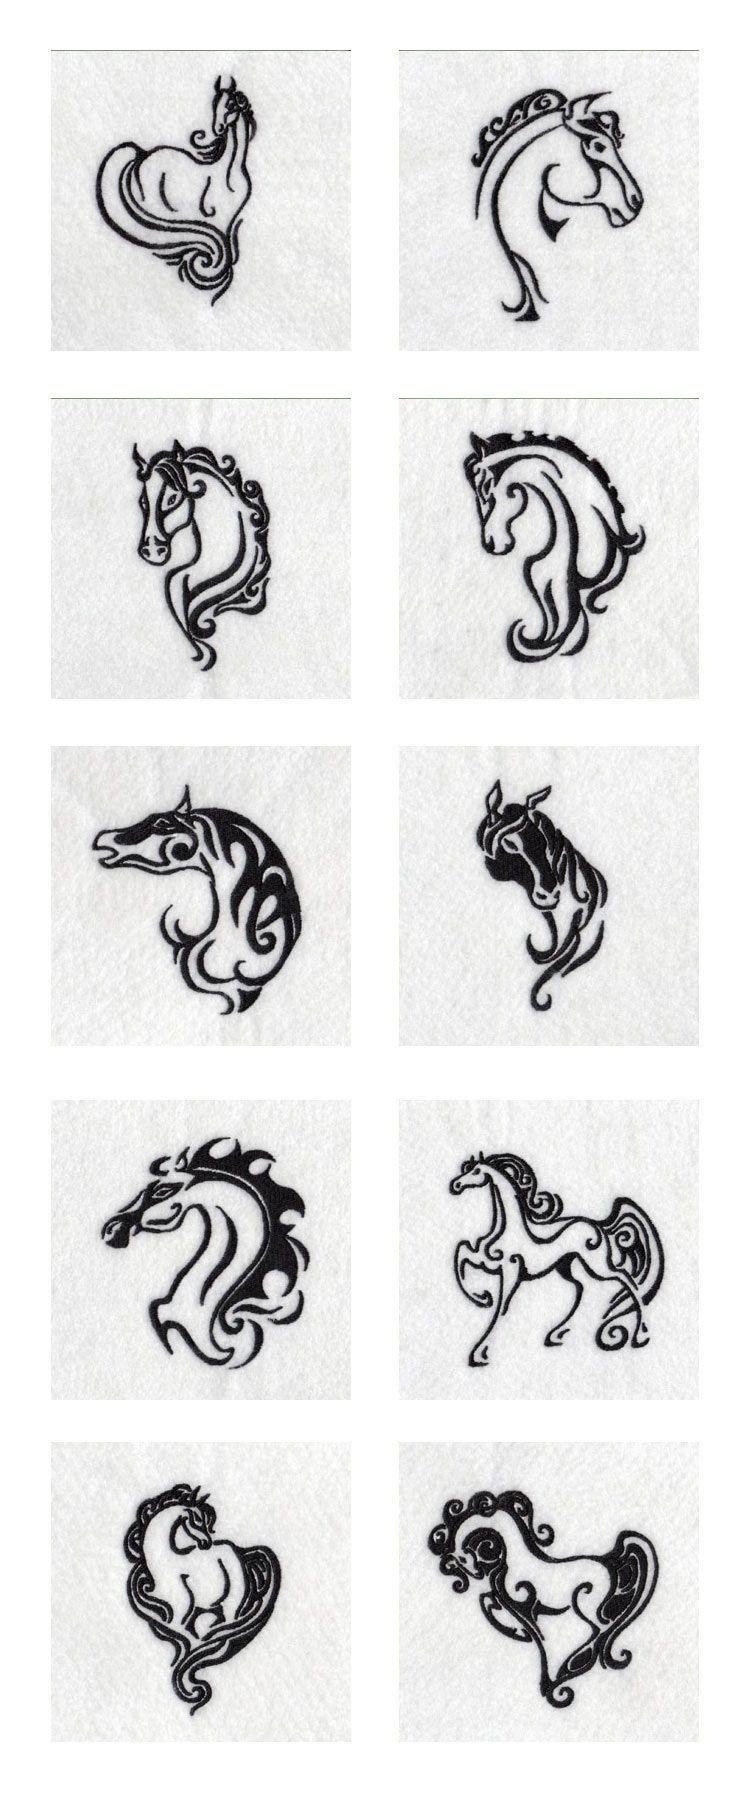 Elegant Wild Horses Embroidery Machine Design Details Horse Small Horse Tattoo Horse Tattoo Tattoos